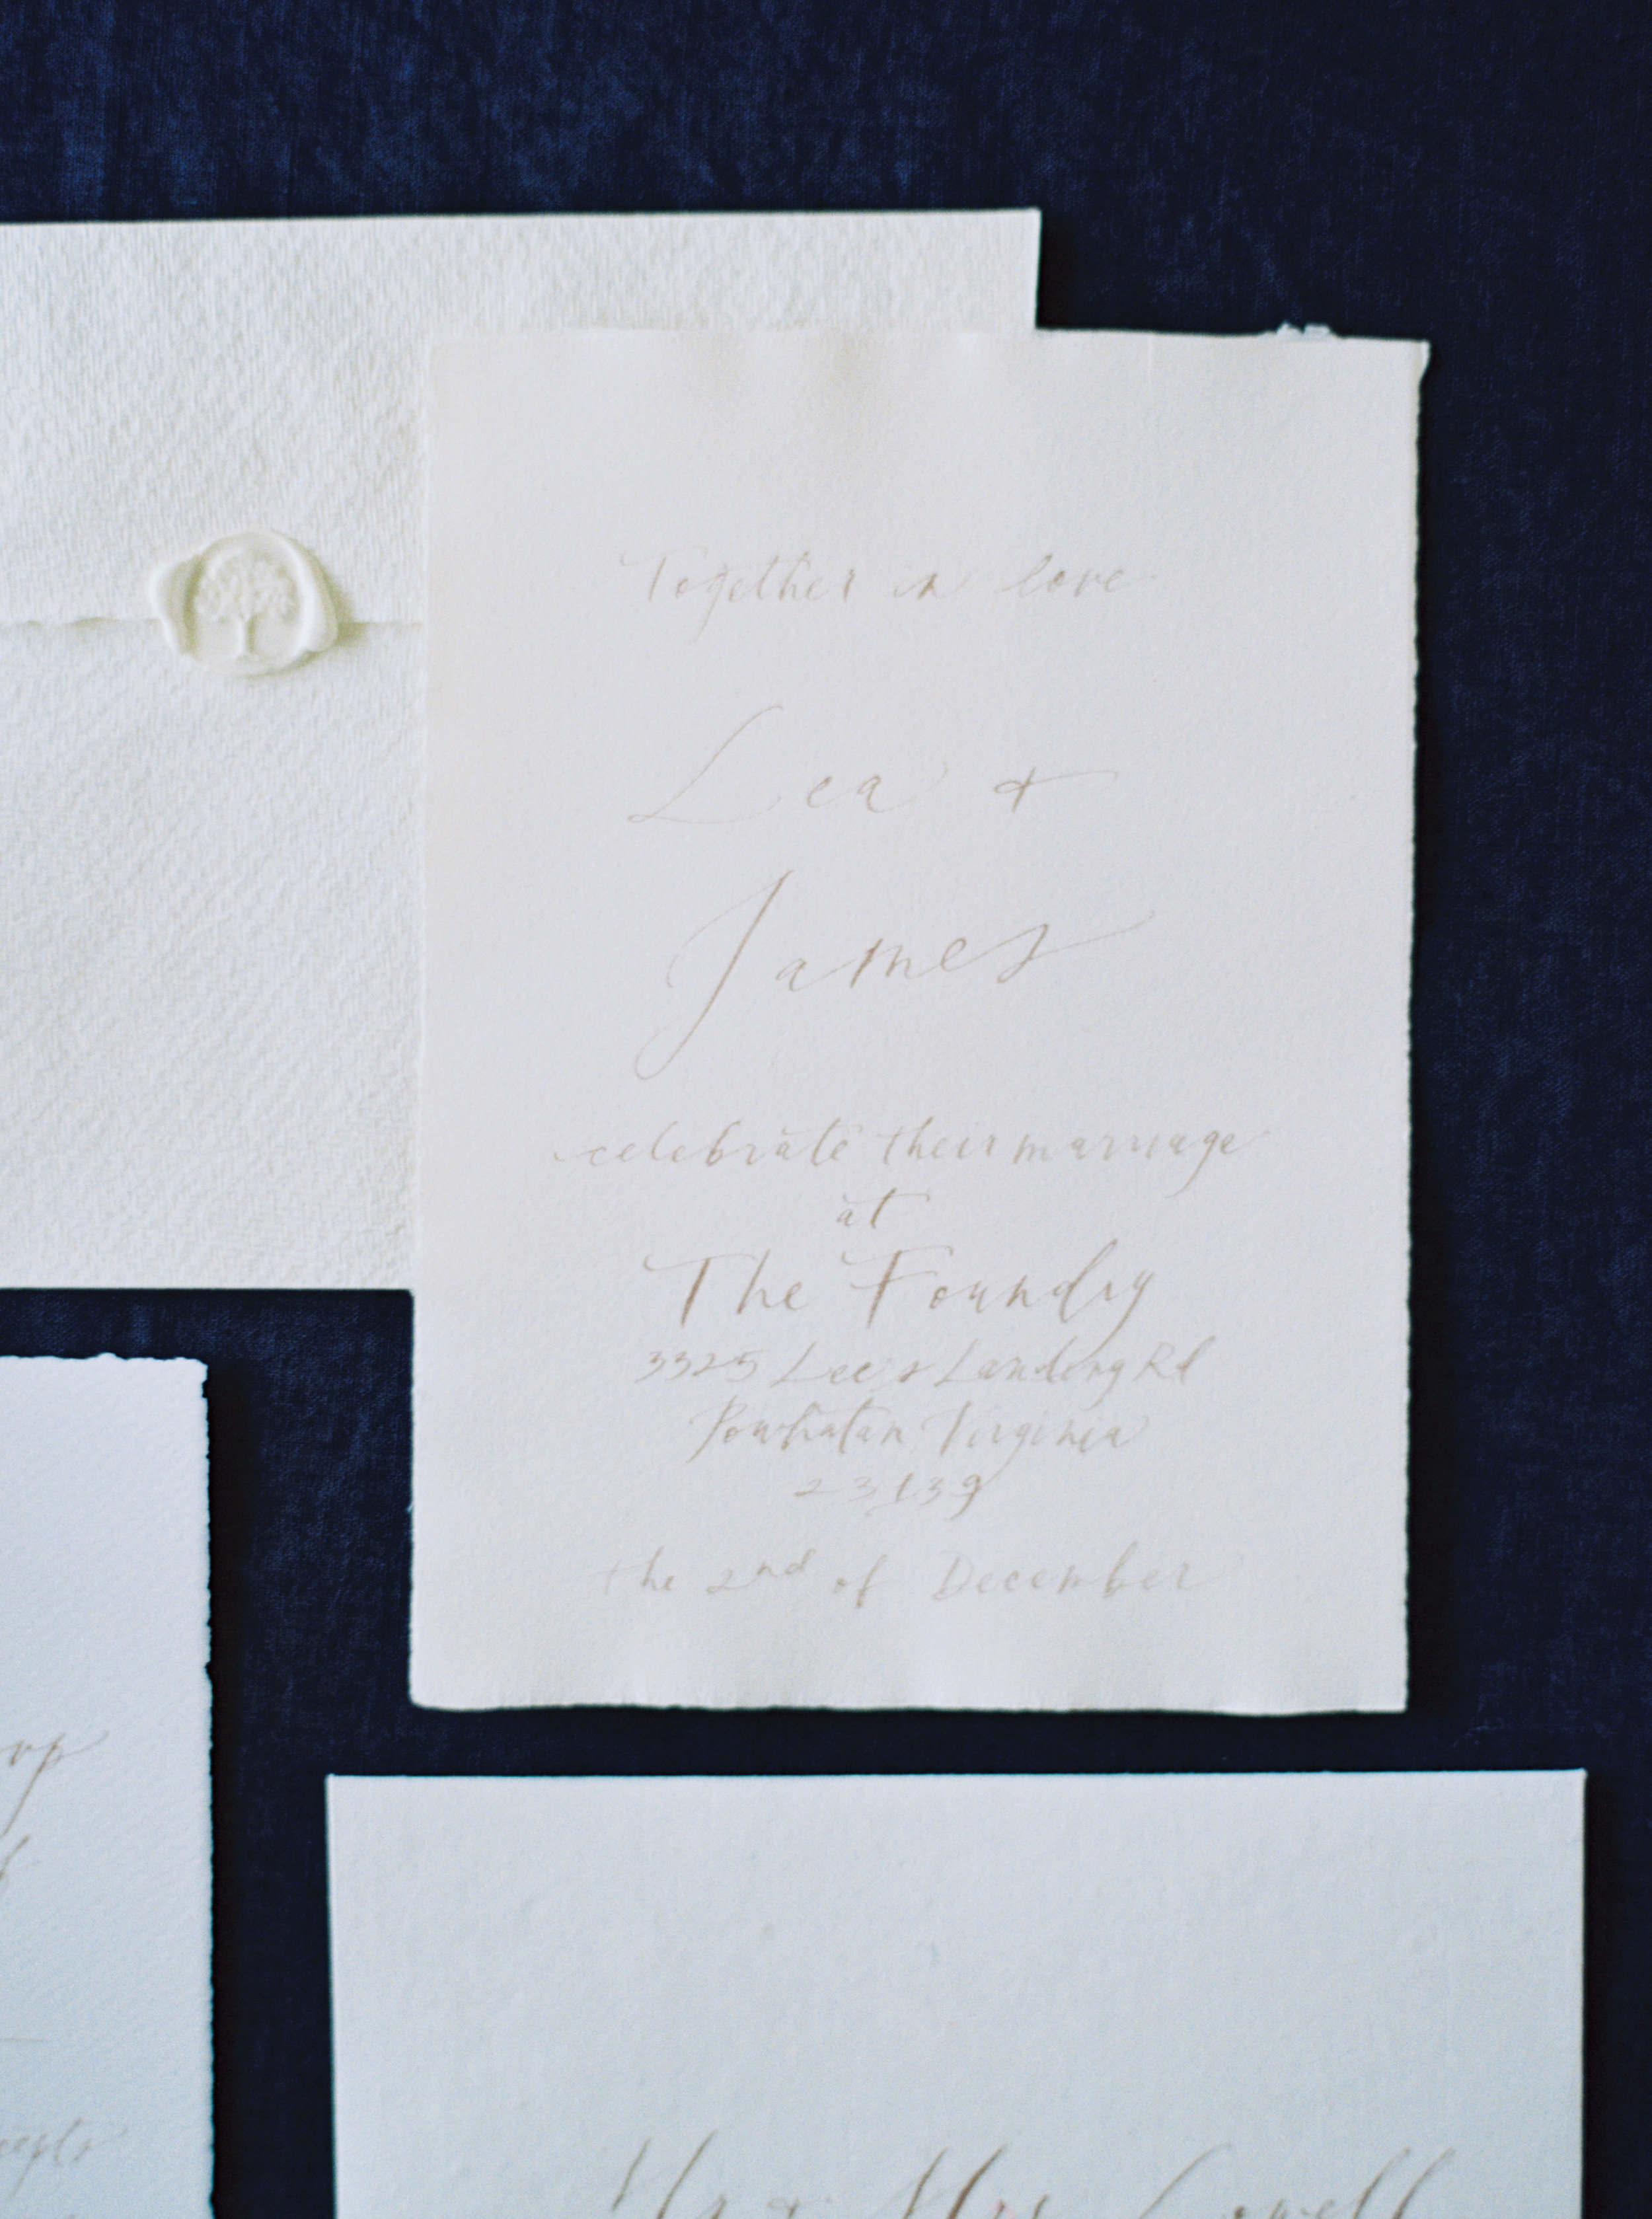 The-Foundry-Weddings-Dec-2016-026.jpg